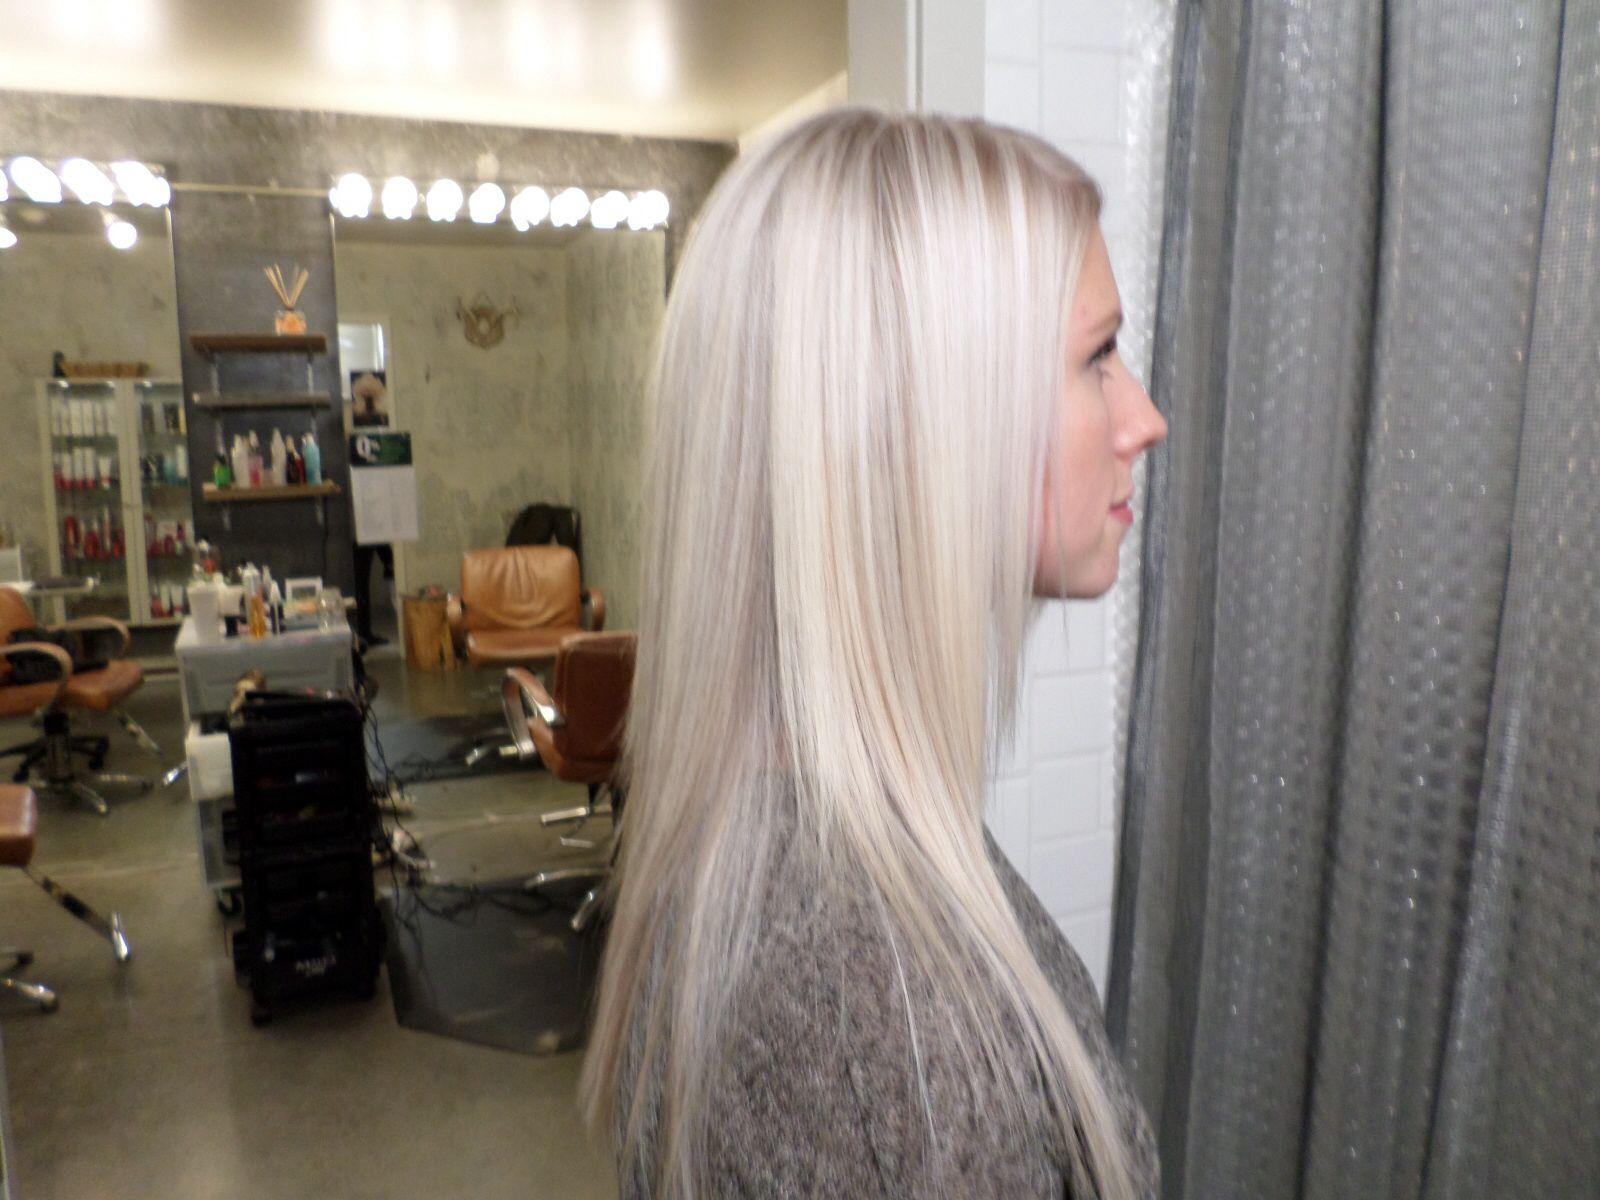 Best 25 Icy blonde ideas on Pinterest  Silver blonde Ashy blonde balayage and Silver blonde hair